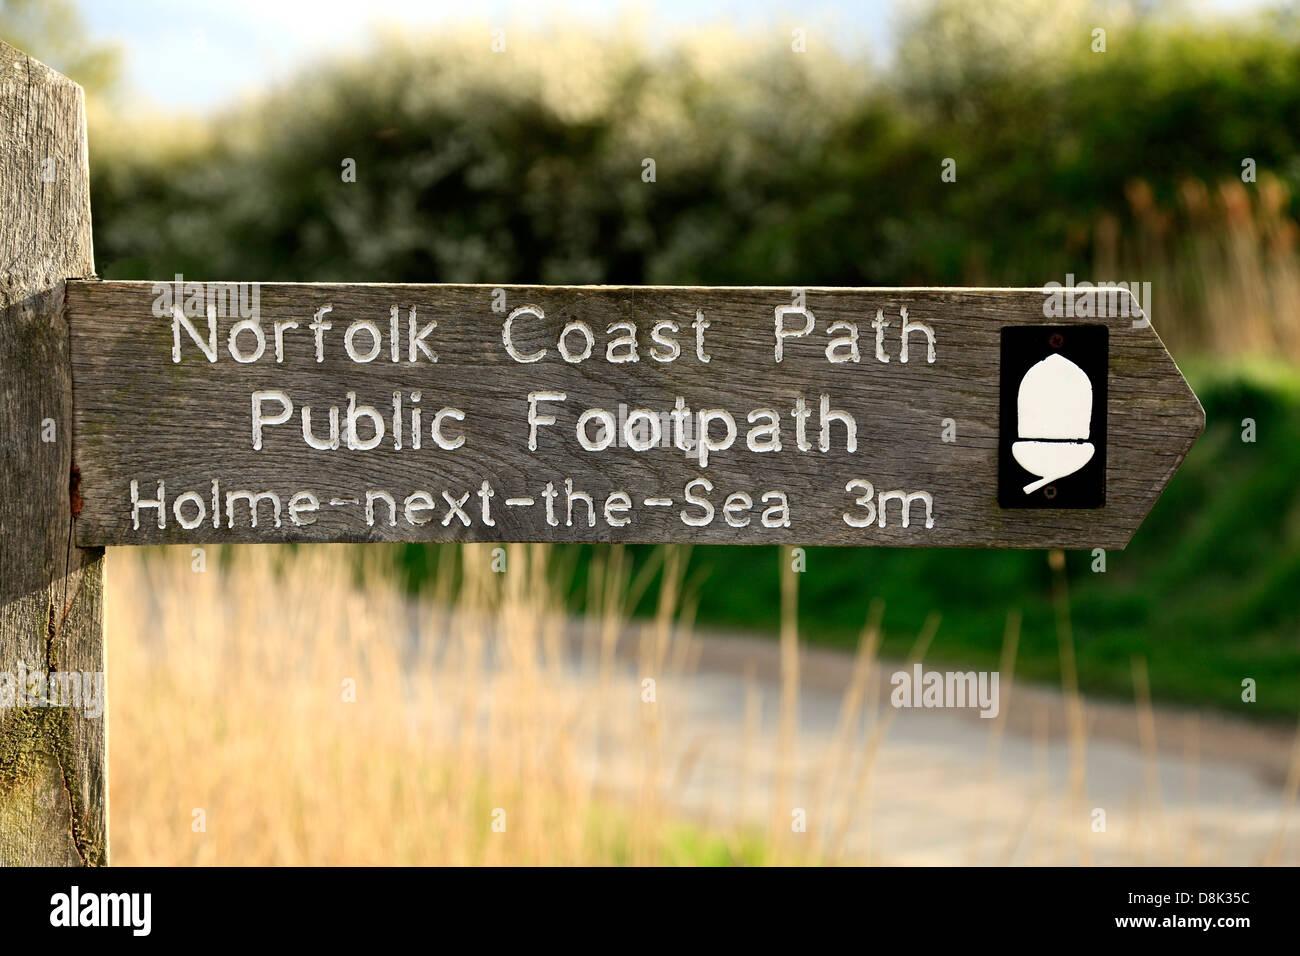 North Norfolk Coast Path, fingerpost, signpost, waymark, public footpath sign signs, England UK - Stock Image